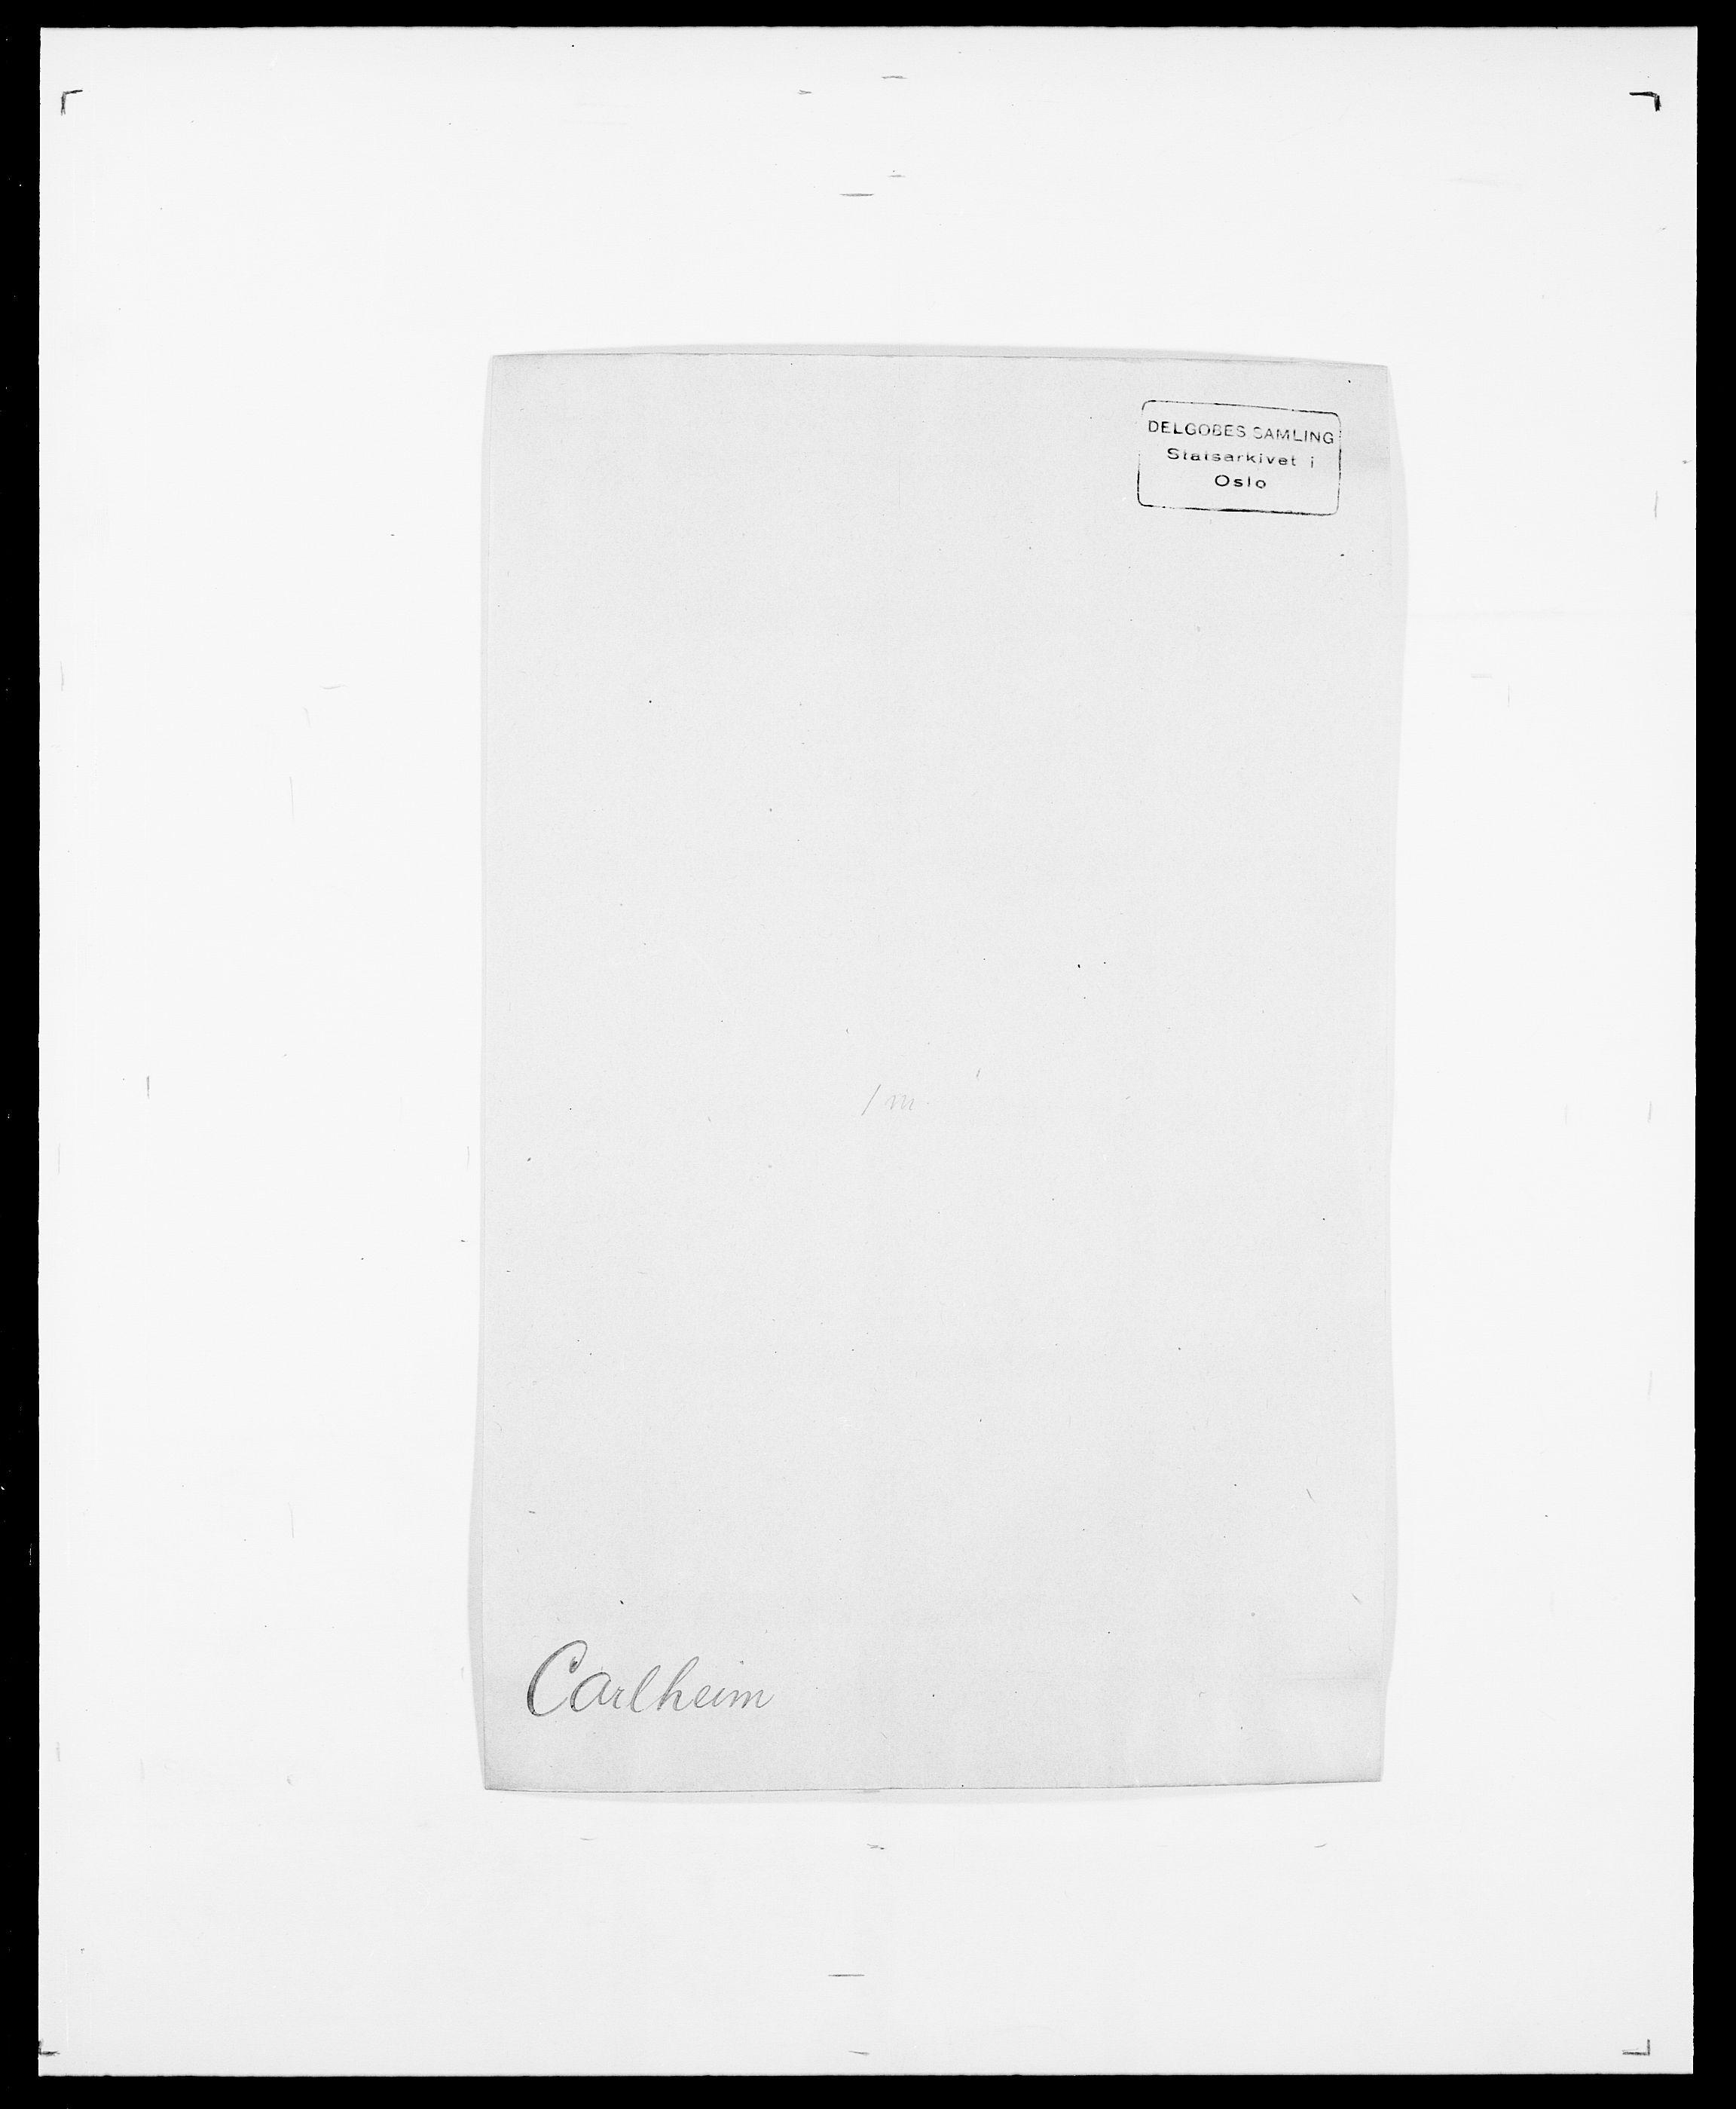 SAO, Delgobe, Charles Antoine - samling, D/Da/L0008: Capjon - Dagenbolt, s. 43